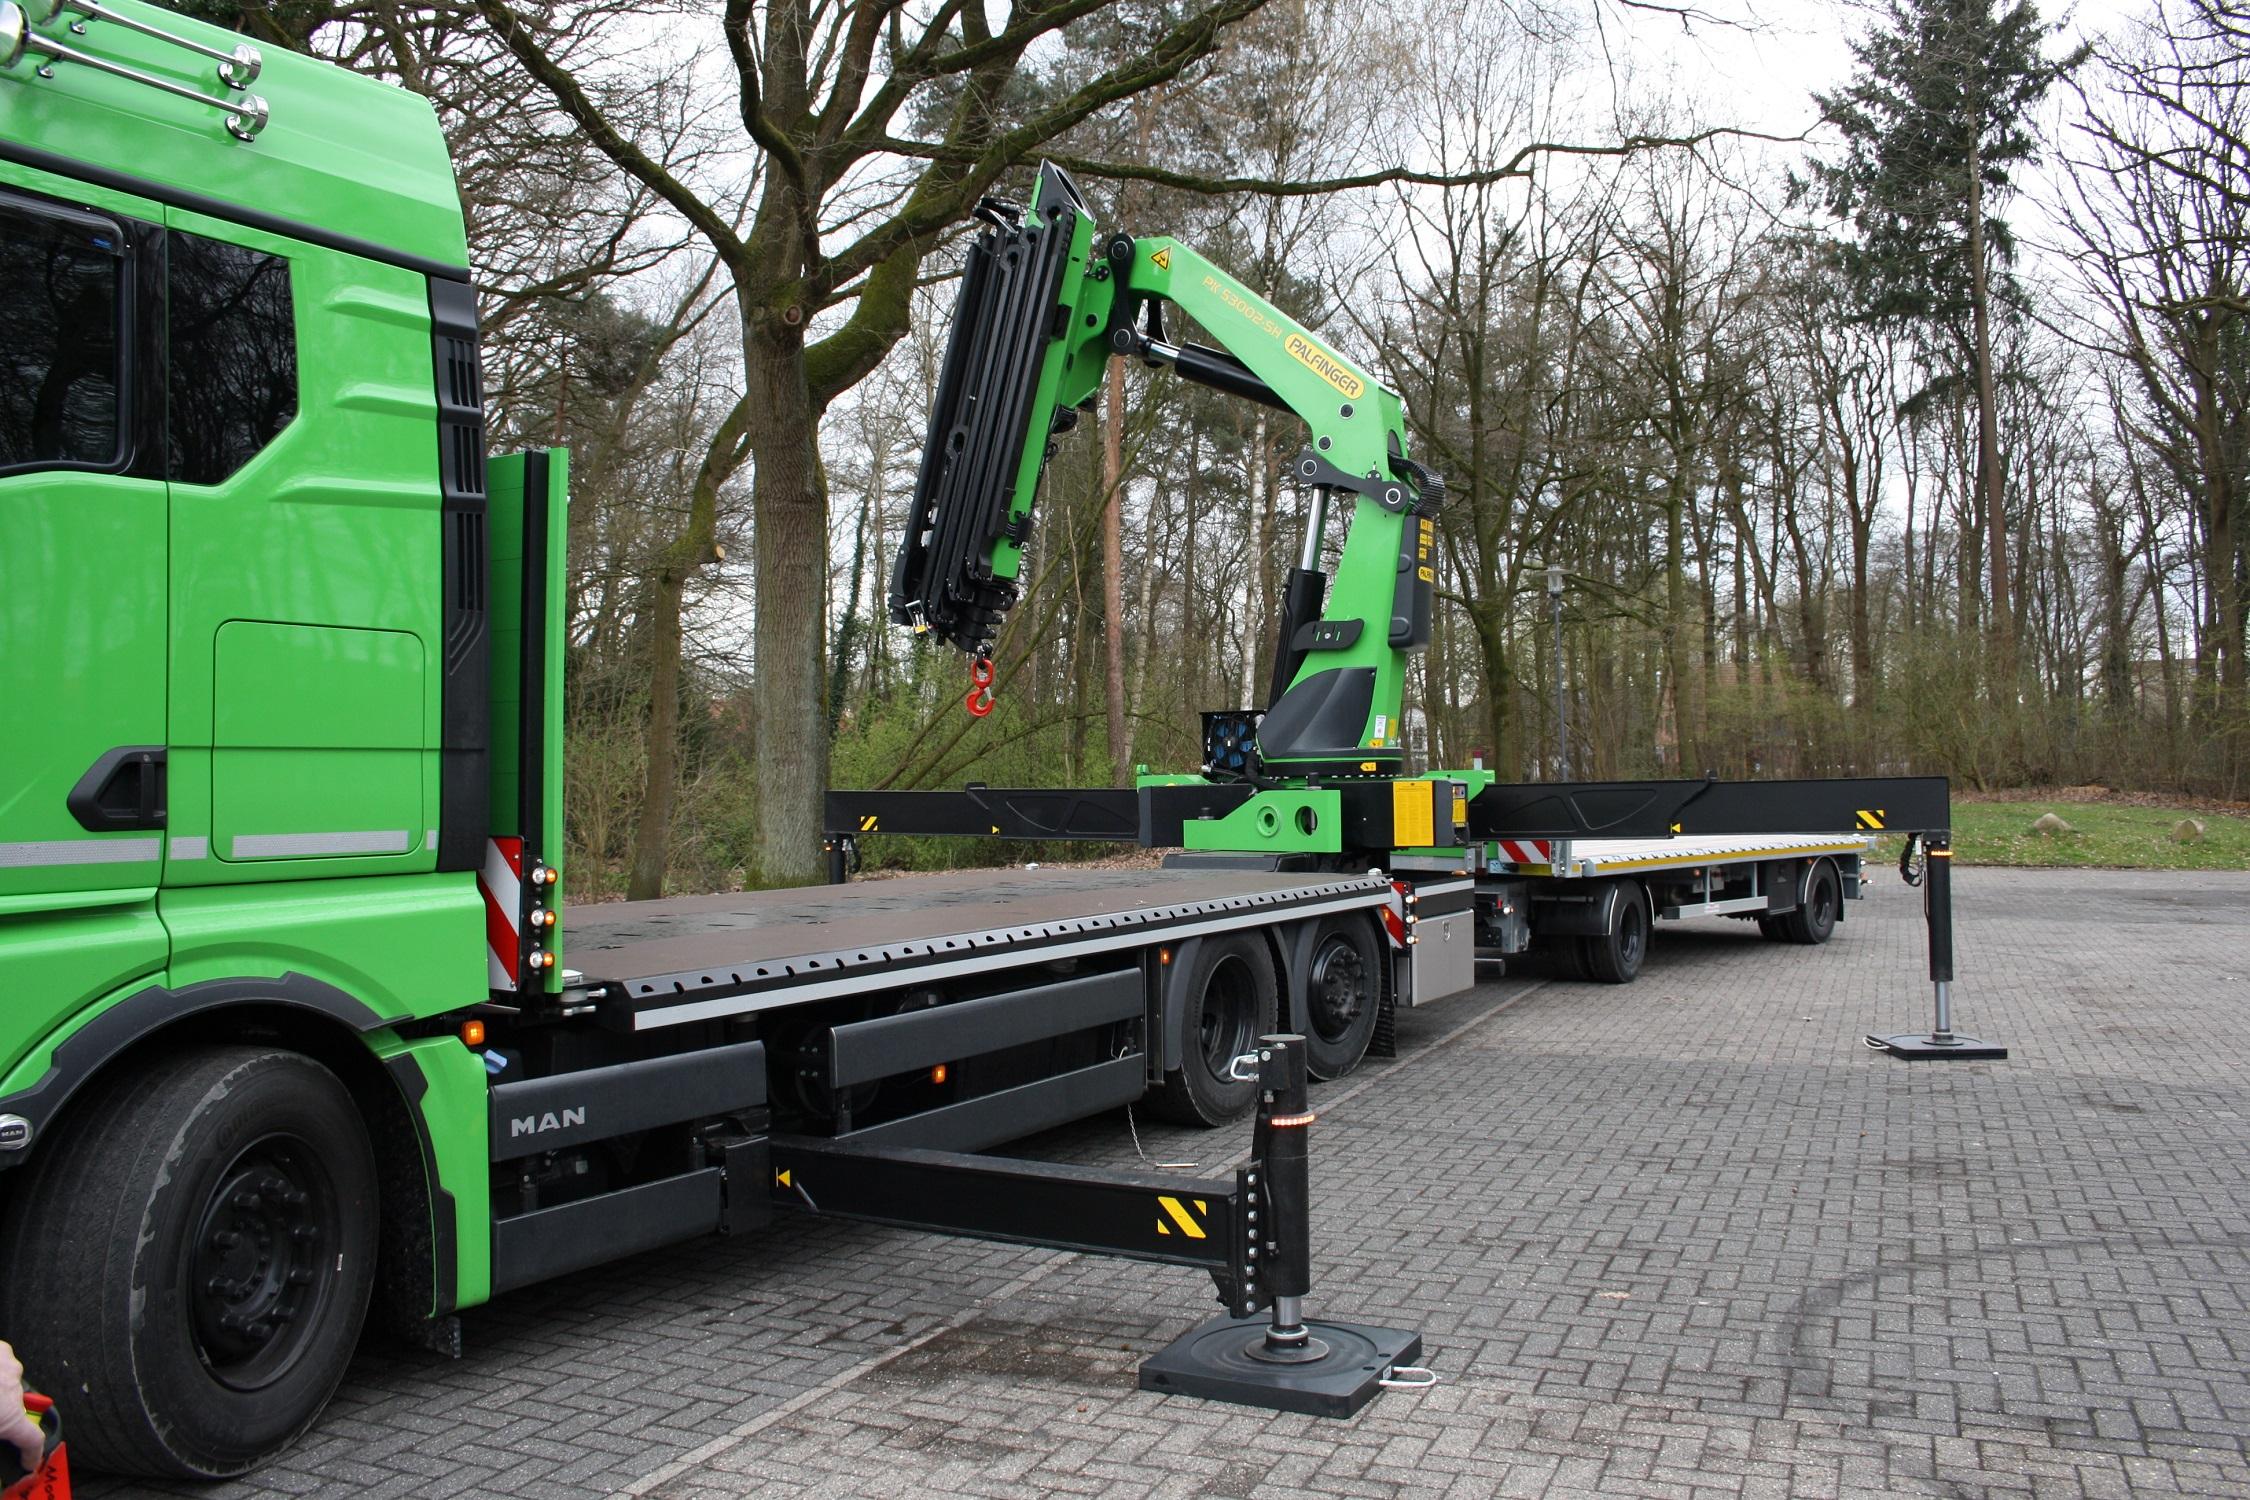 Ladekran-Aufbauten - Hängerzug mit Kran - Fahrzeugbau velsycon